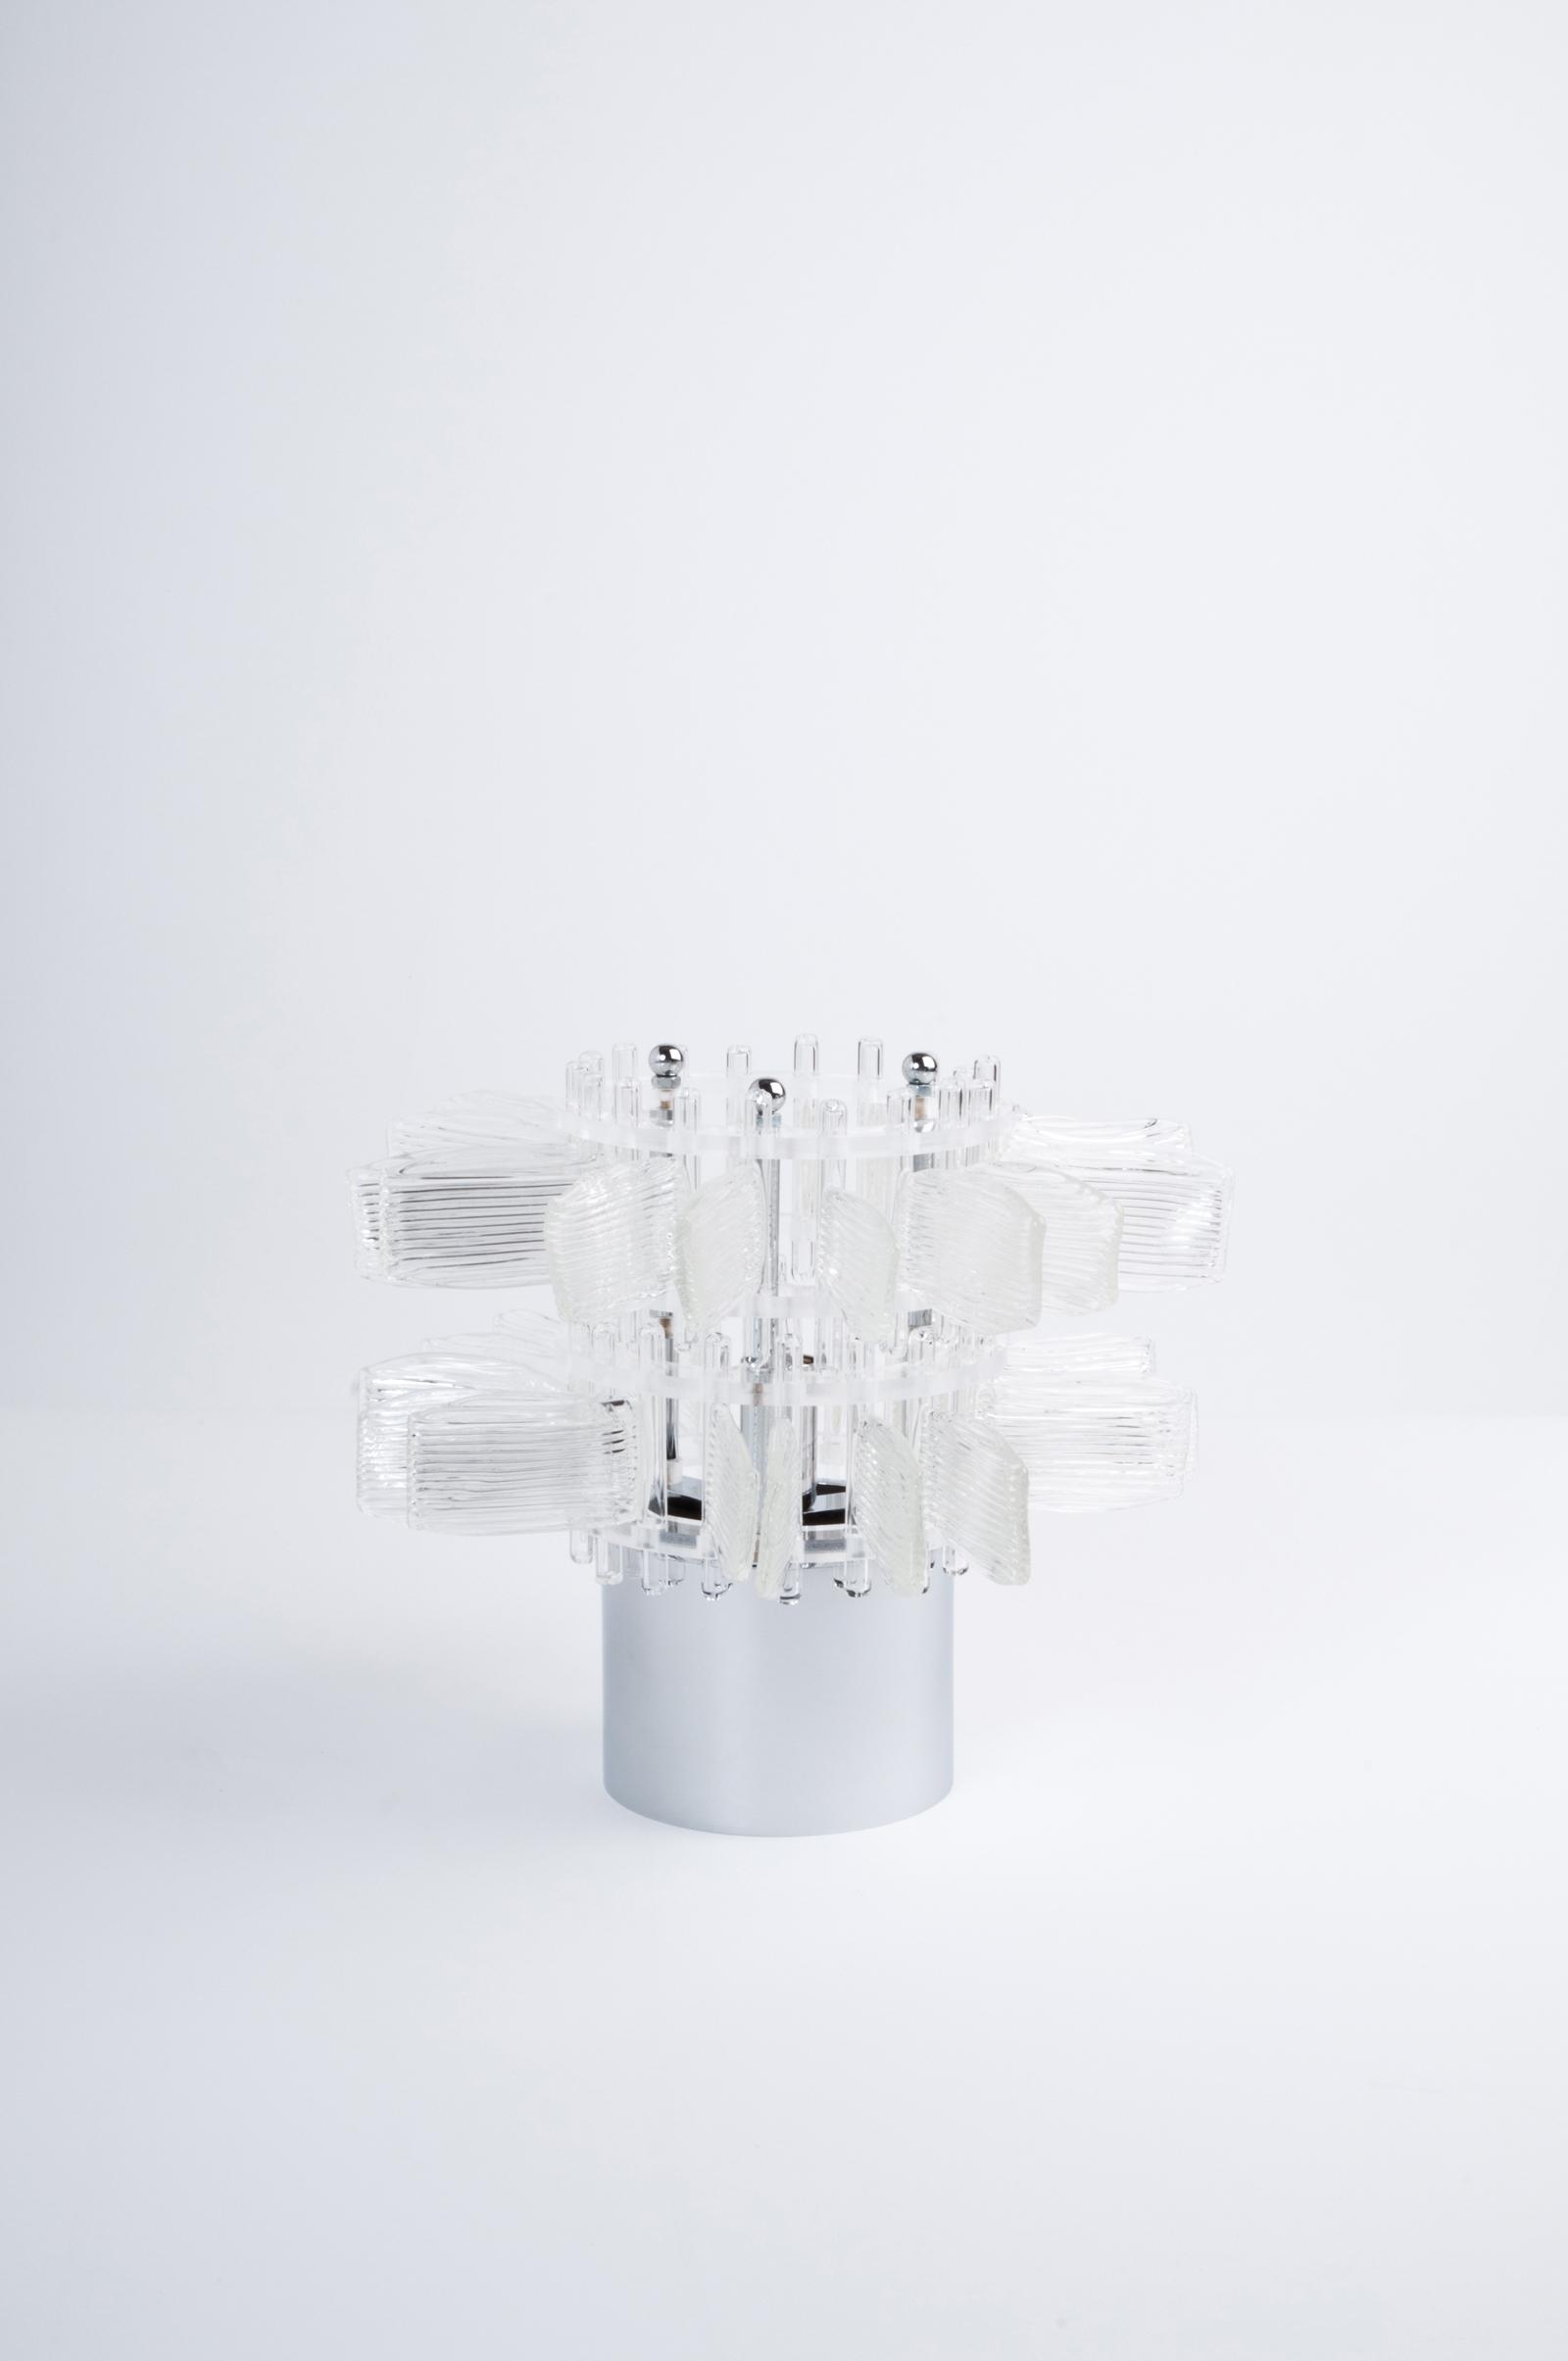 anemone-20-table-chrome-cristal-crystal-veronese-maurizio-galante-tal-lancman-11.jpg